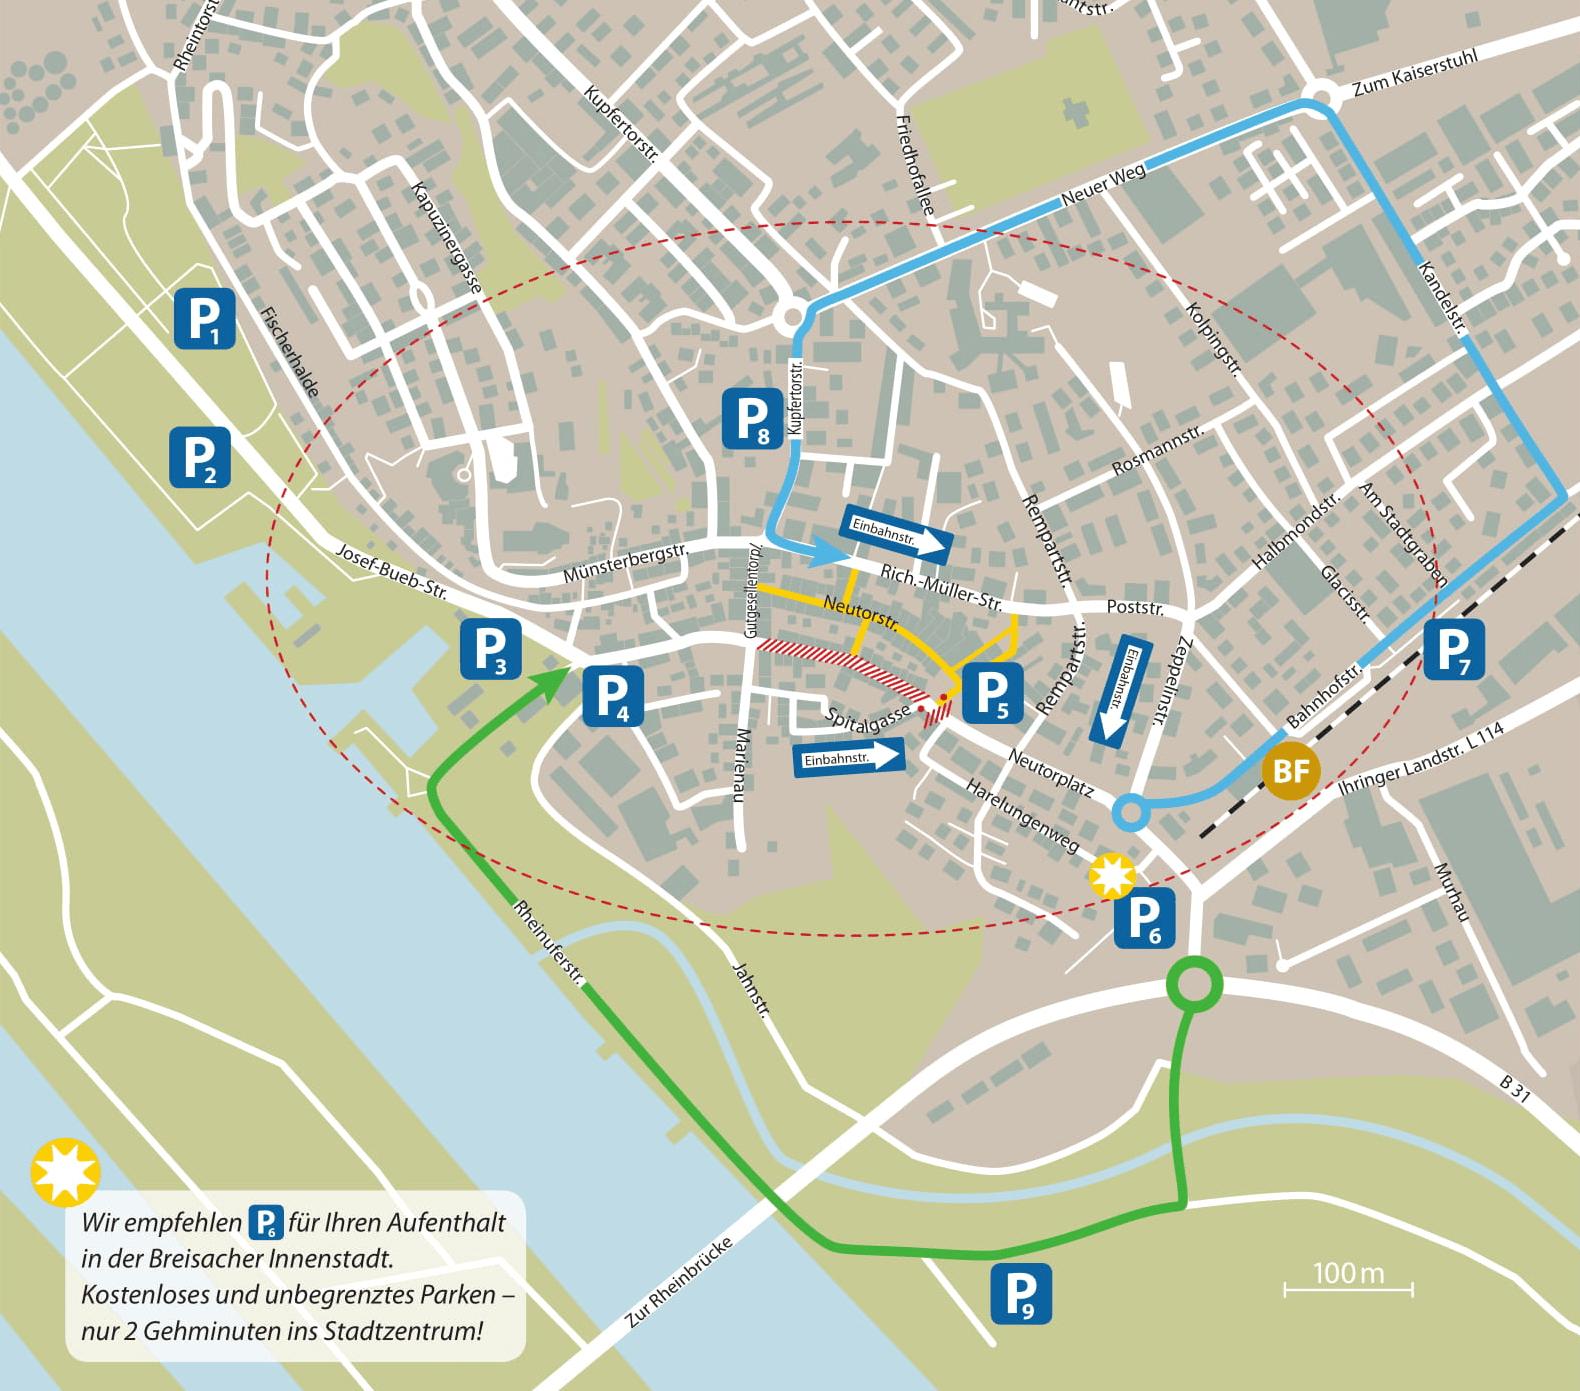 Auszug Karte _ Parkplatzfyer 4-min.png